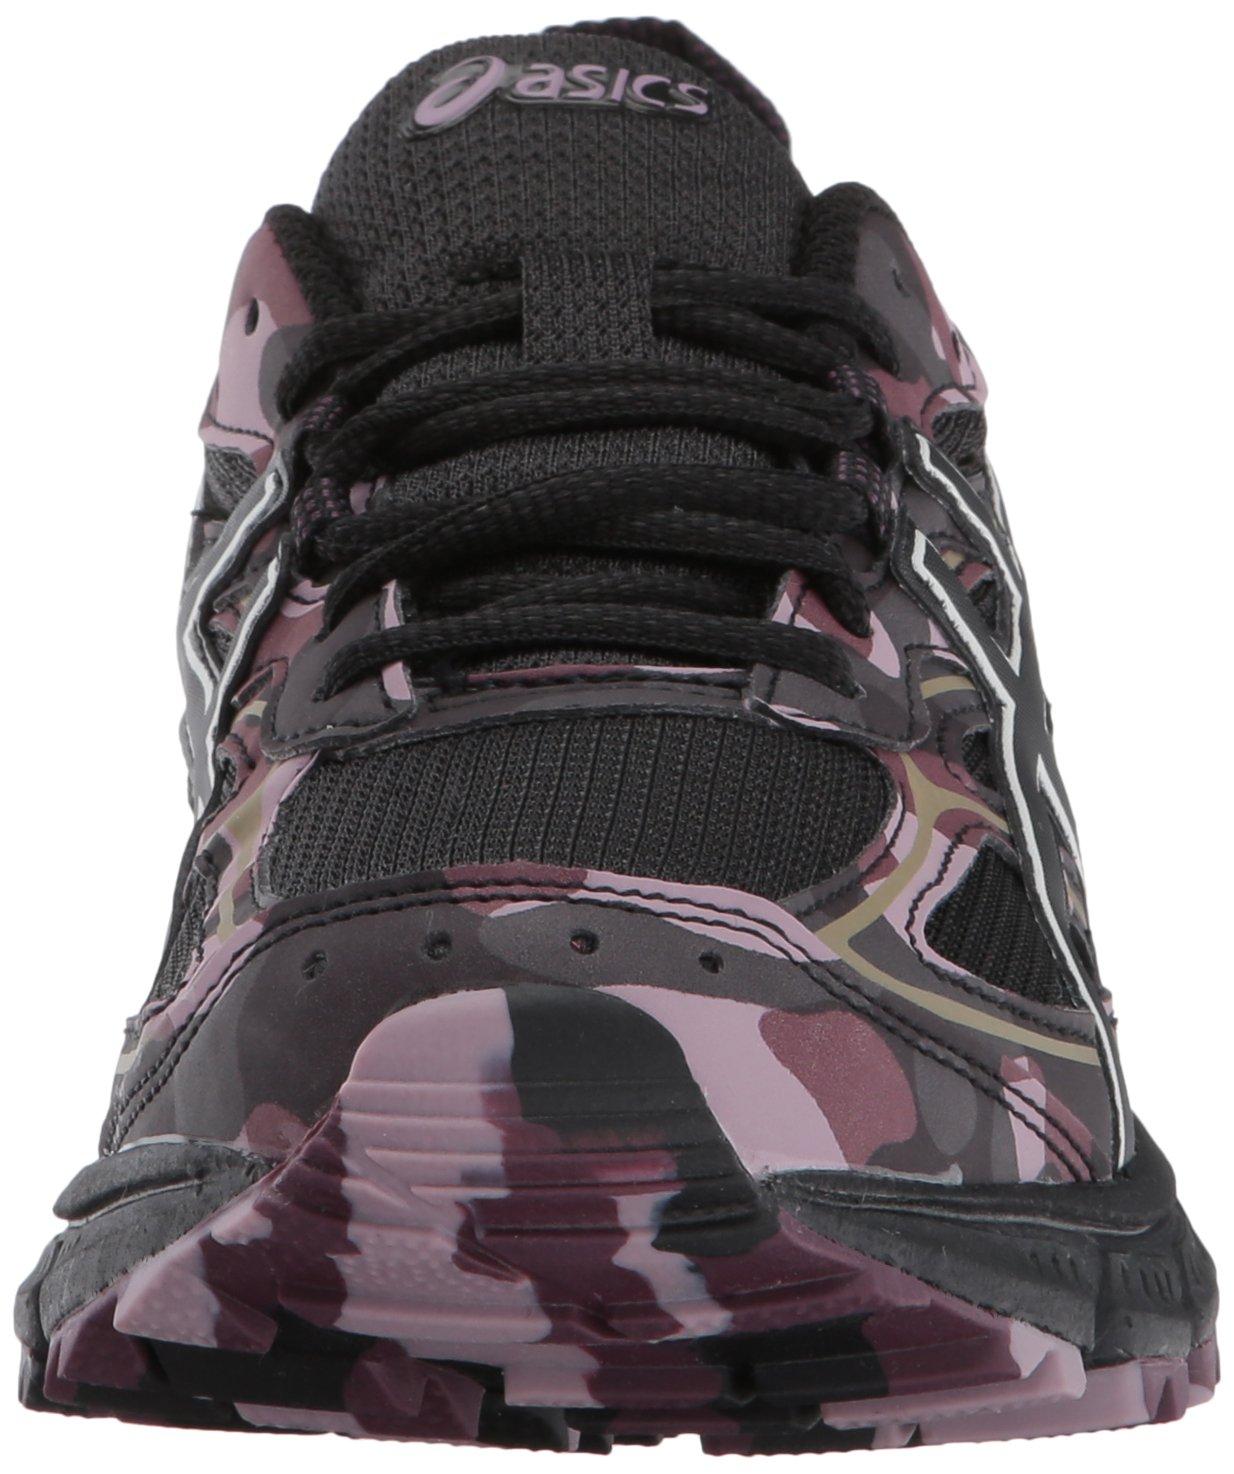 ASICS Women's Gel-Scram 3 Trail Runner B01N02XH0R 7.5 B(M) US Phantom/Phantom/Eggplant